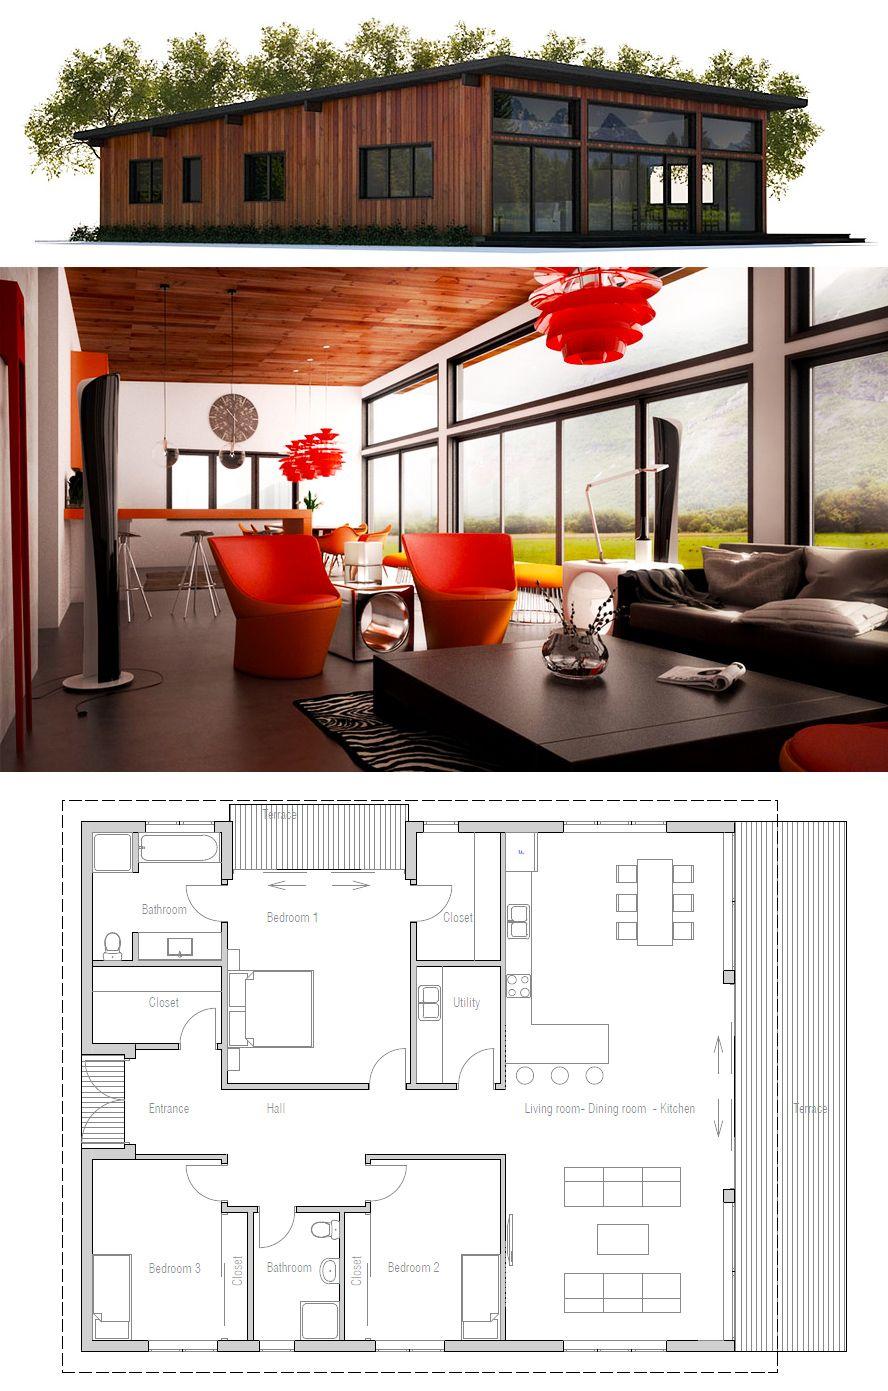 House plan architecture passive house pinterest house